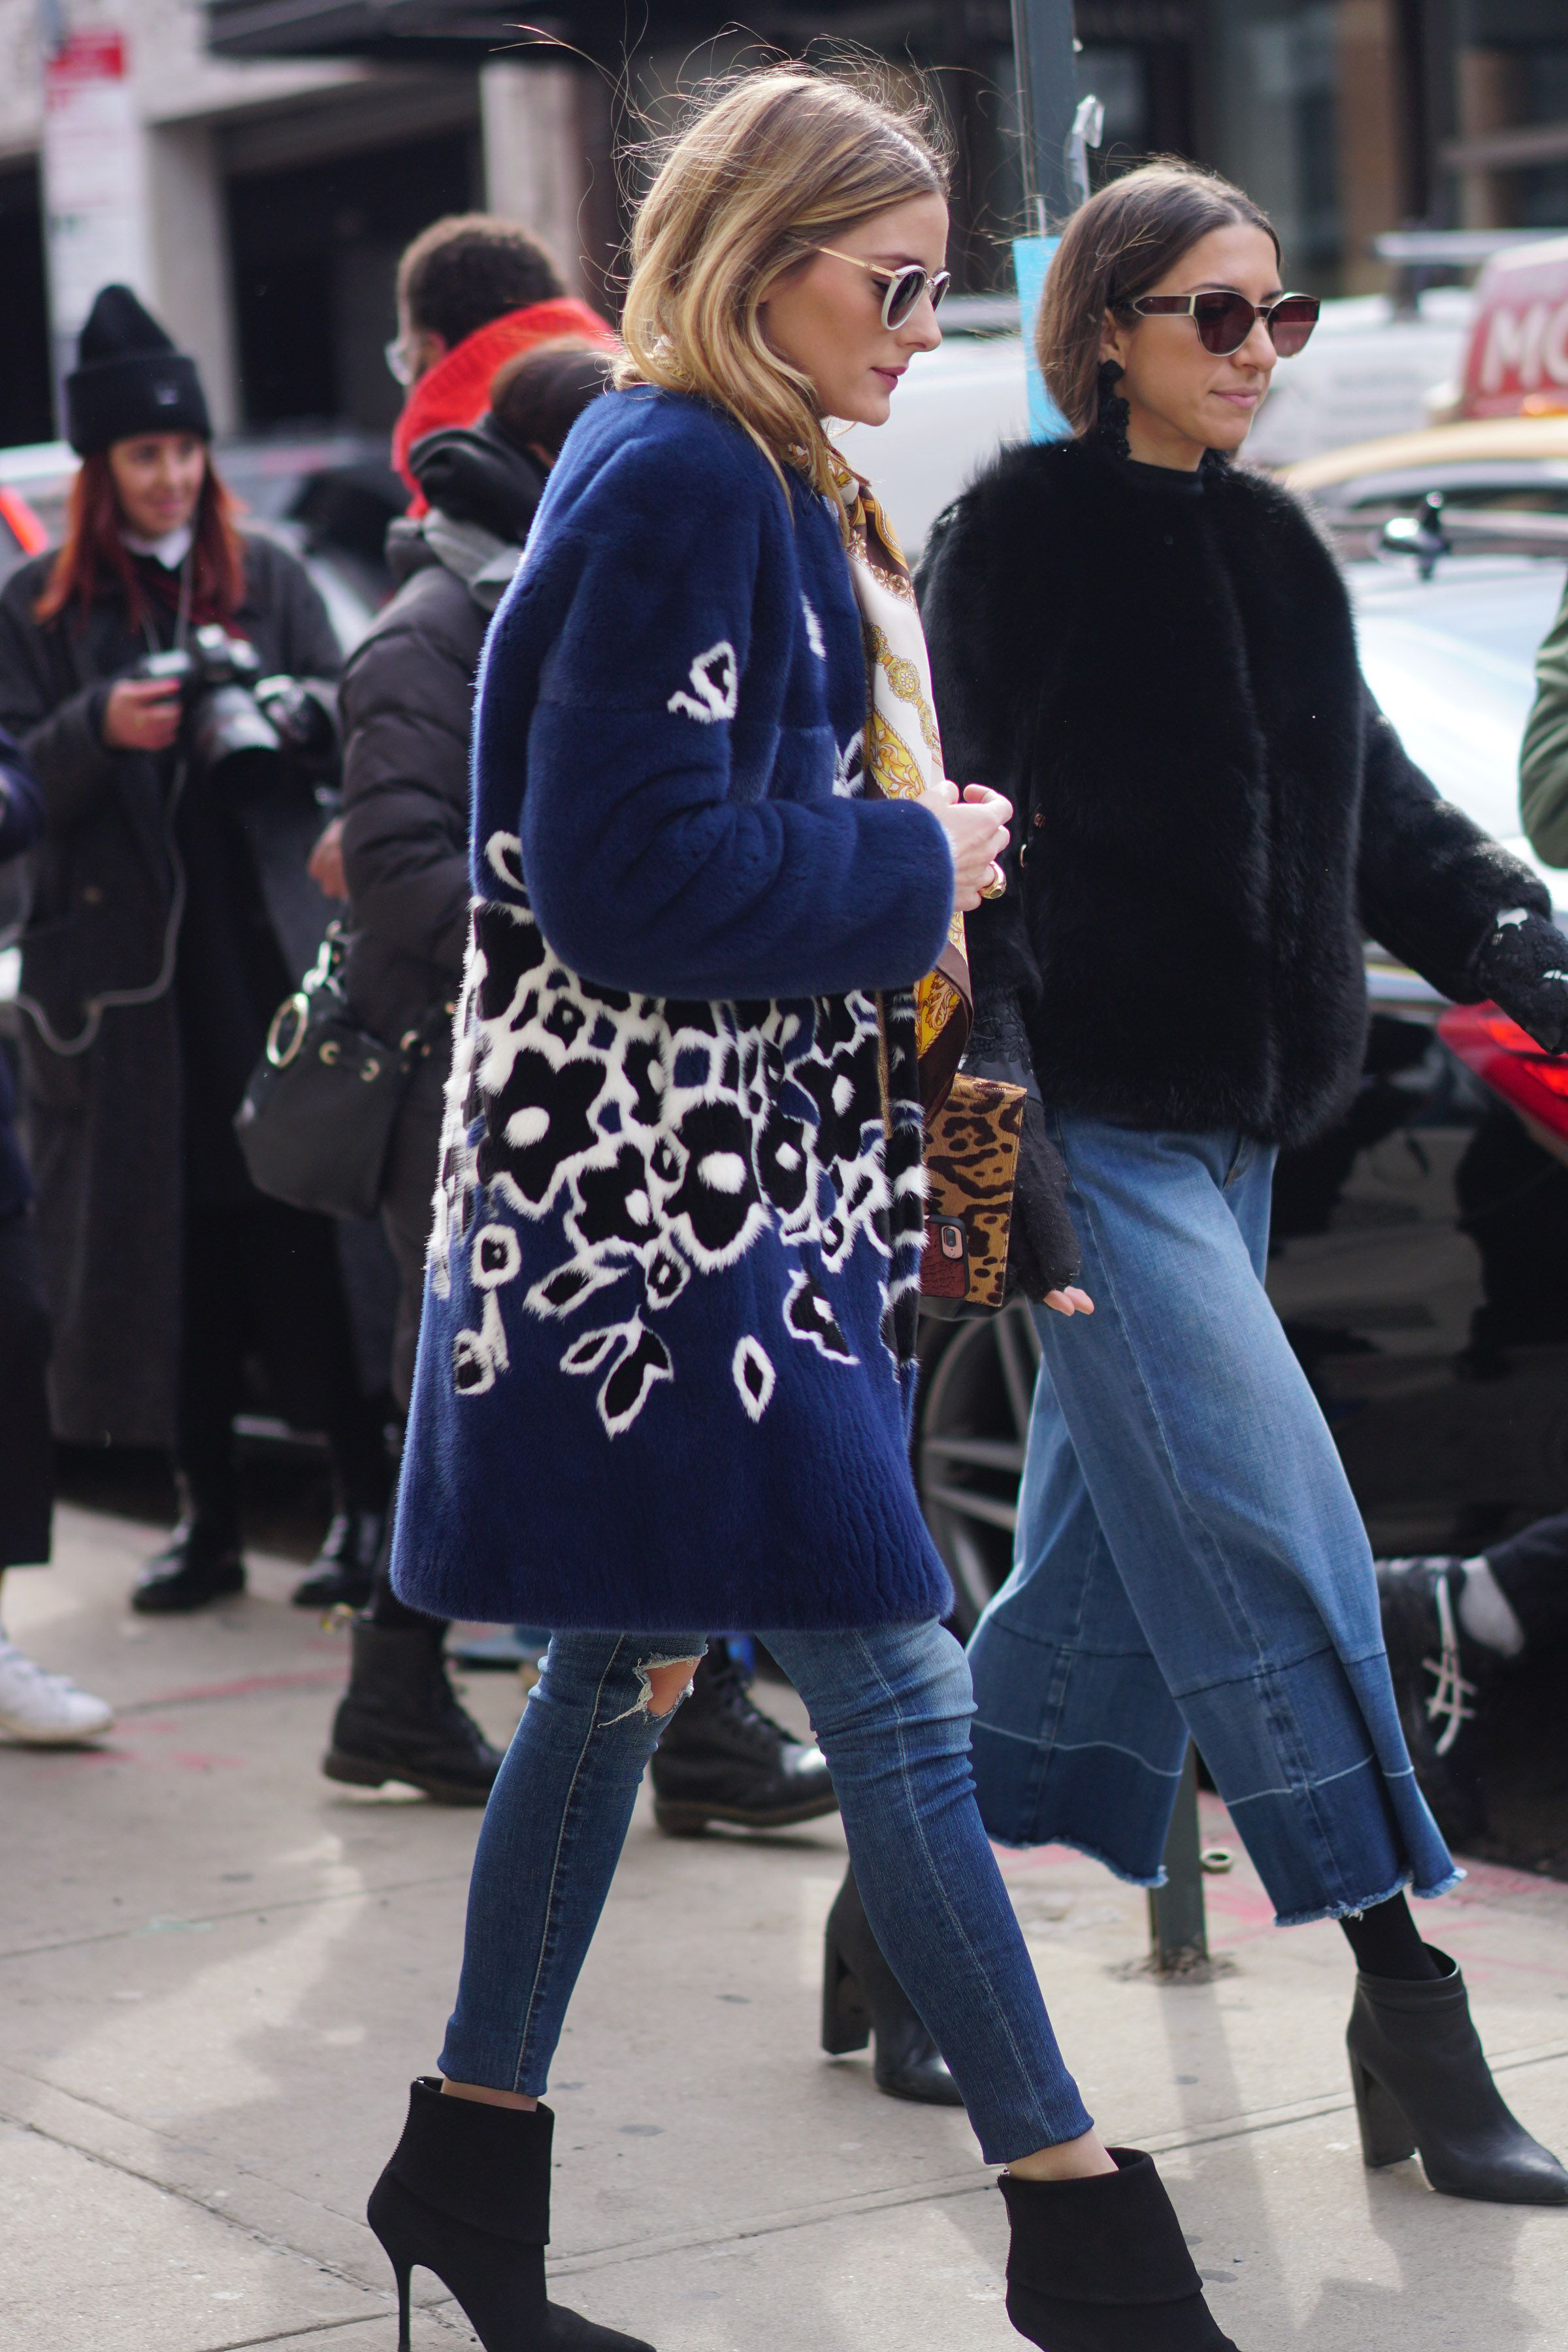 PalermoCoast's 2017 Favourite Fashion Olivia New Week York Street DYHeIbWE29